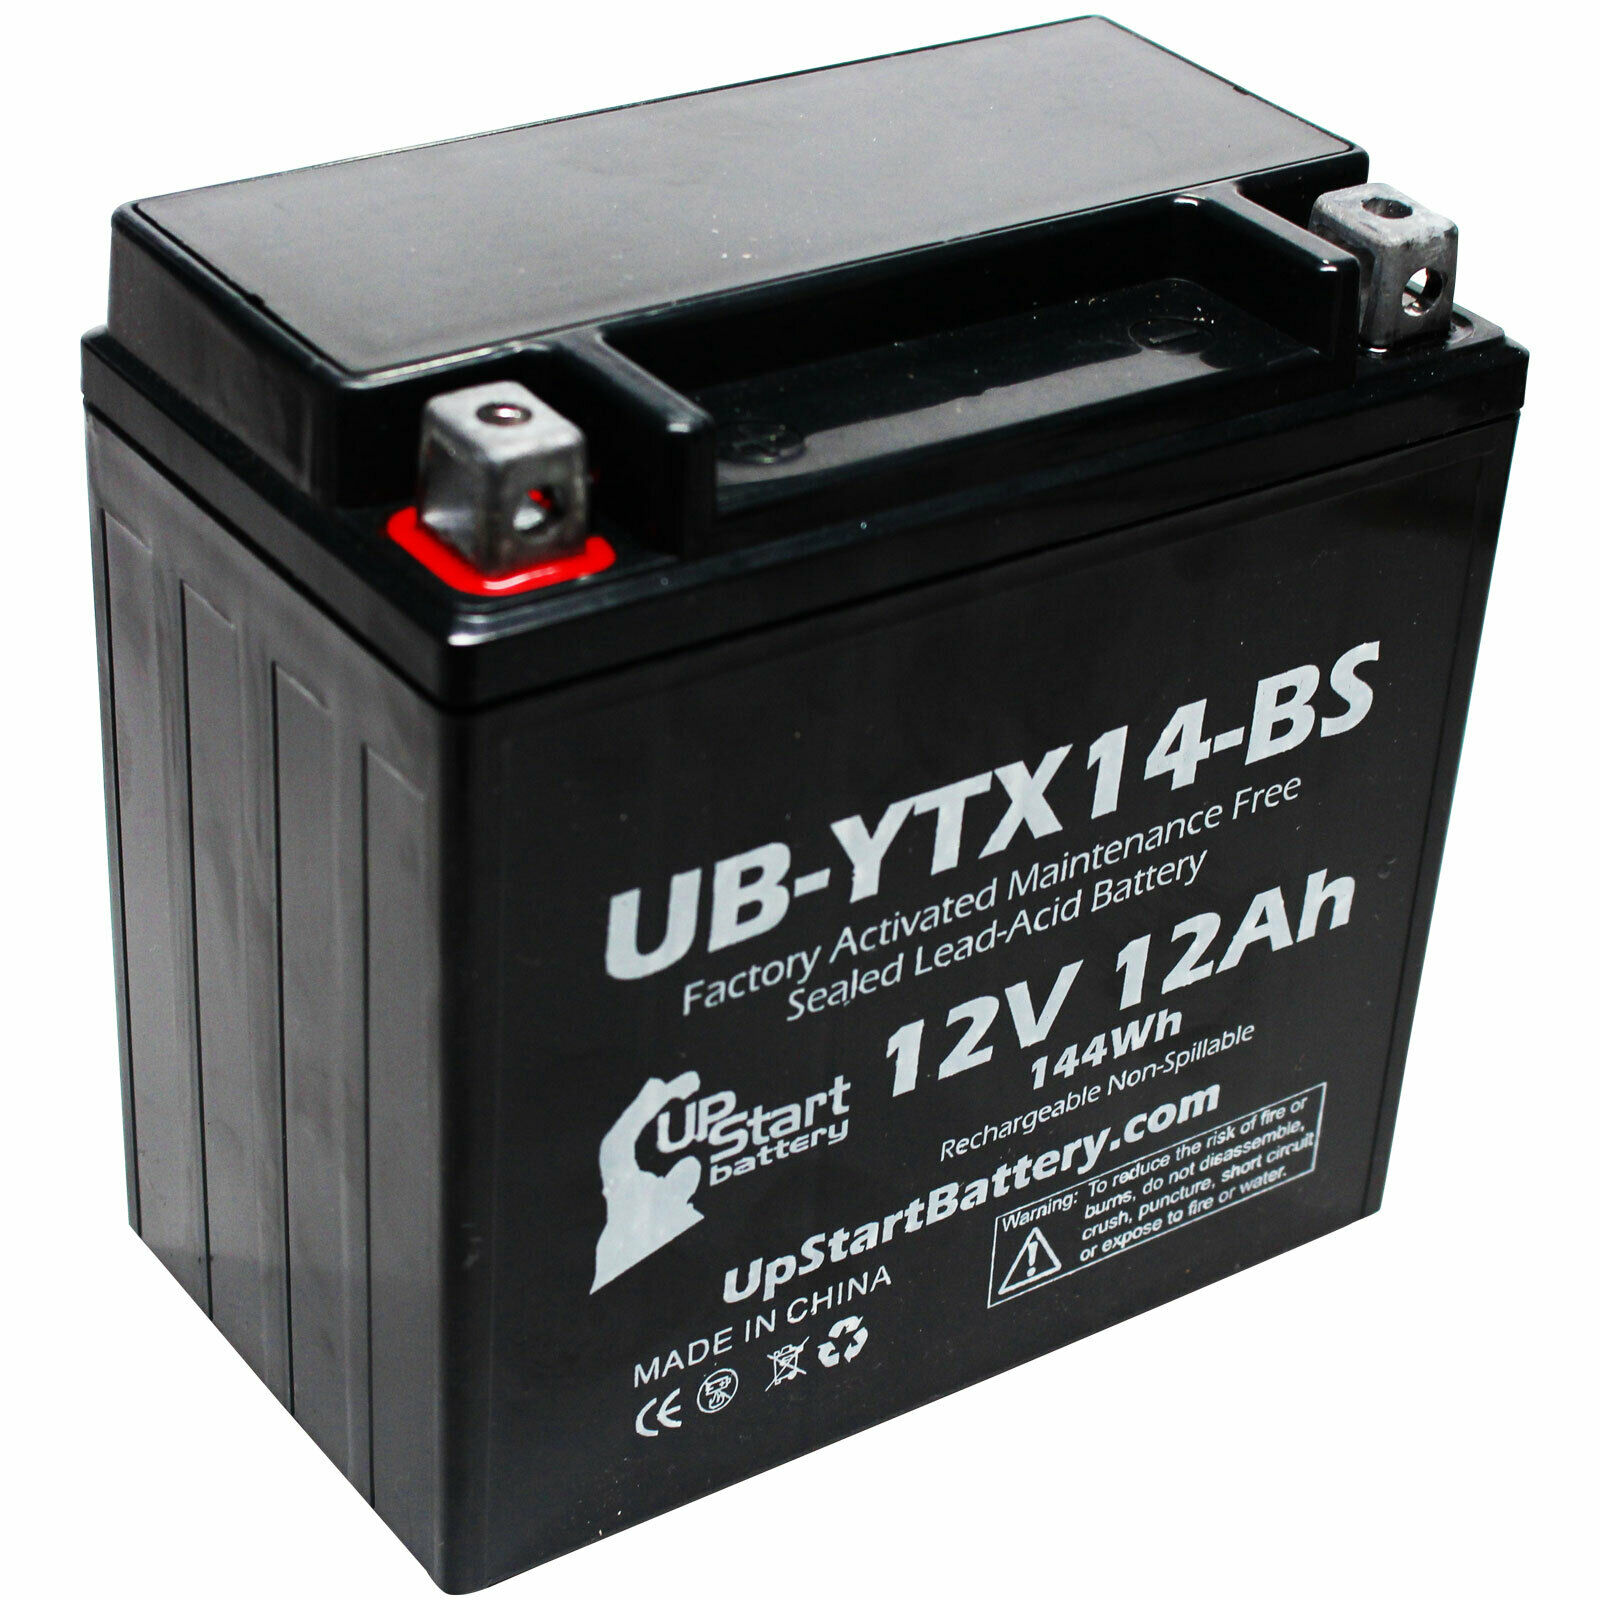 12V 12AH Battery for 1987 Honda TRX350, D FourTrax 4x4 350 CC